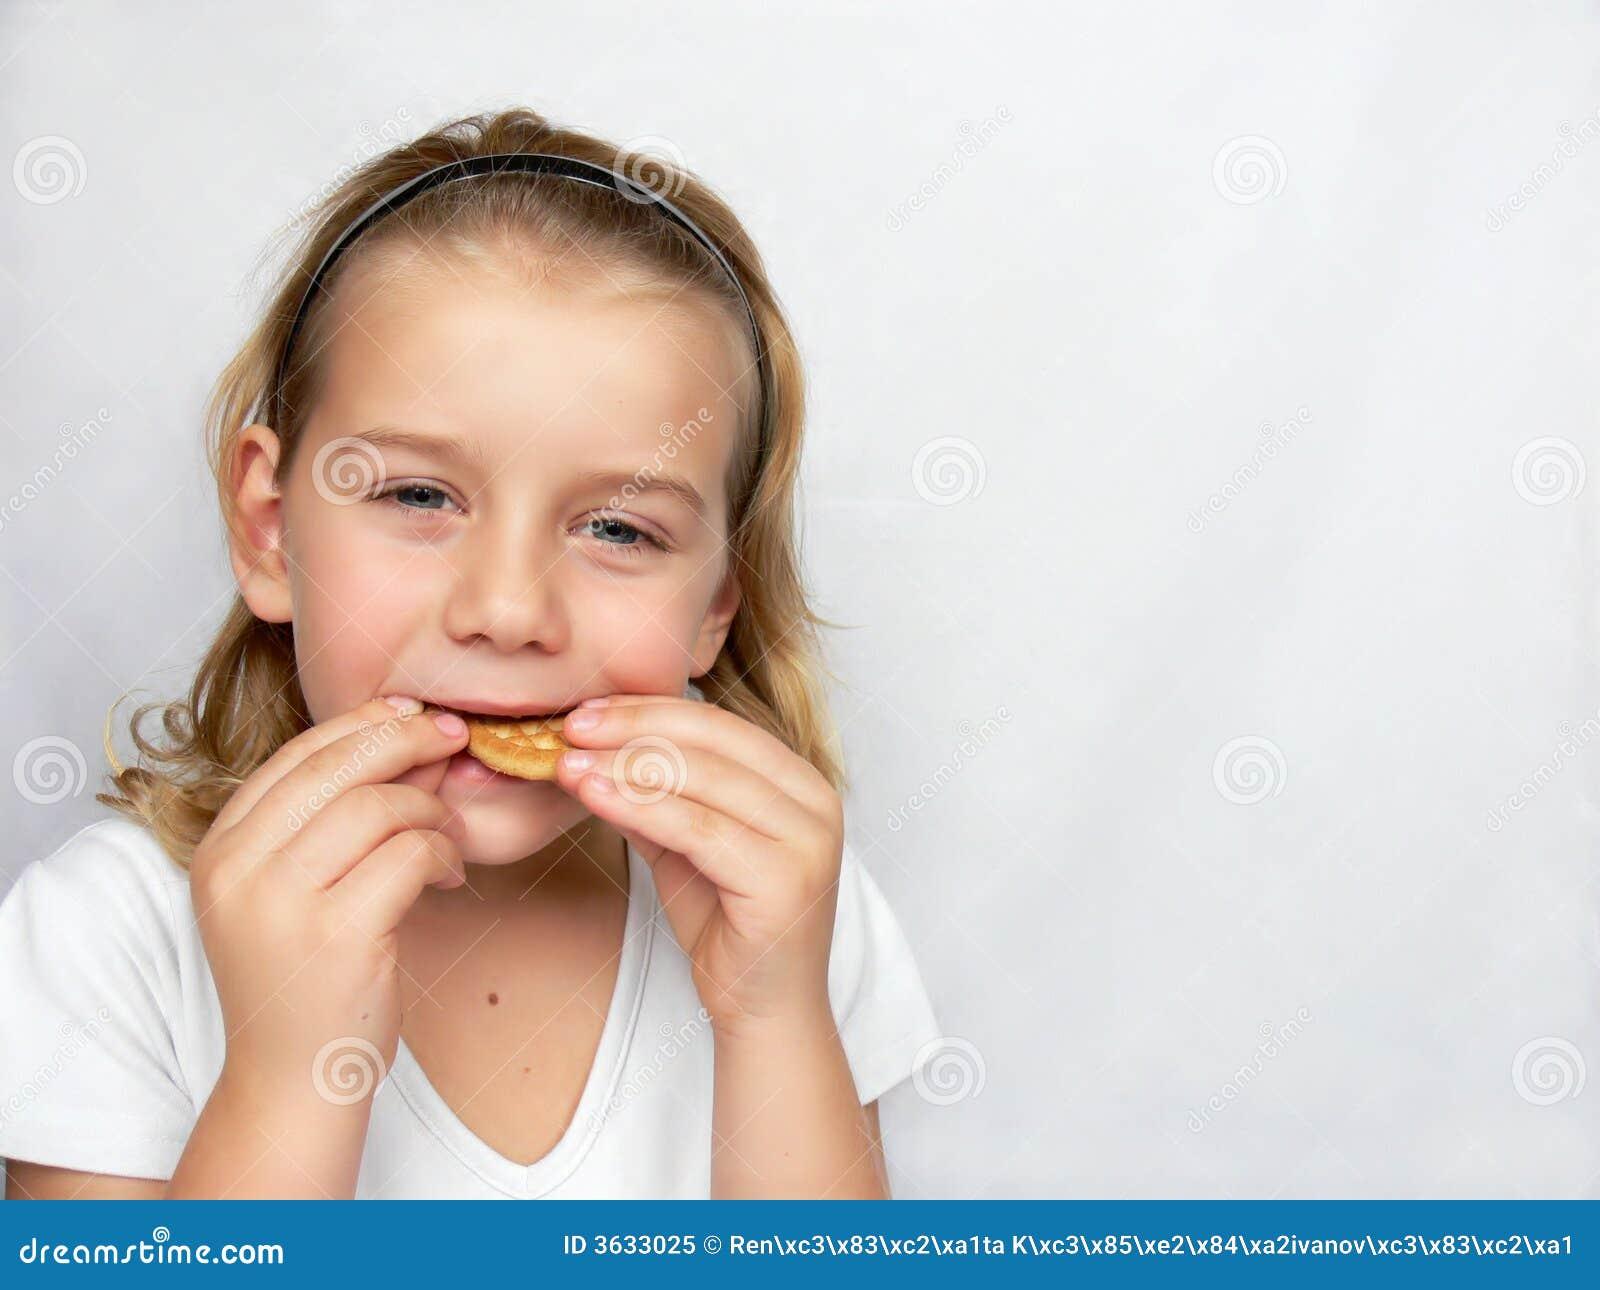 Junge isst Plätzchen